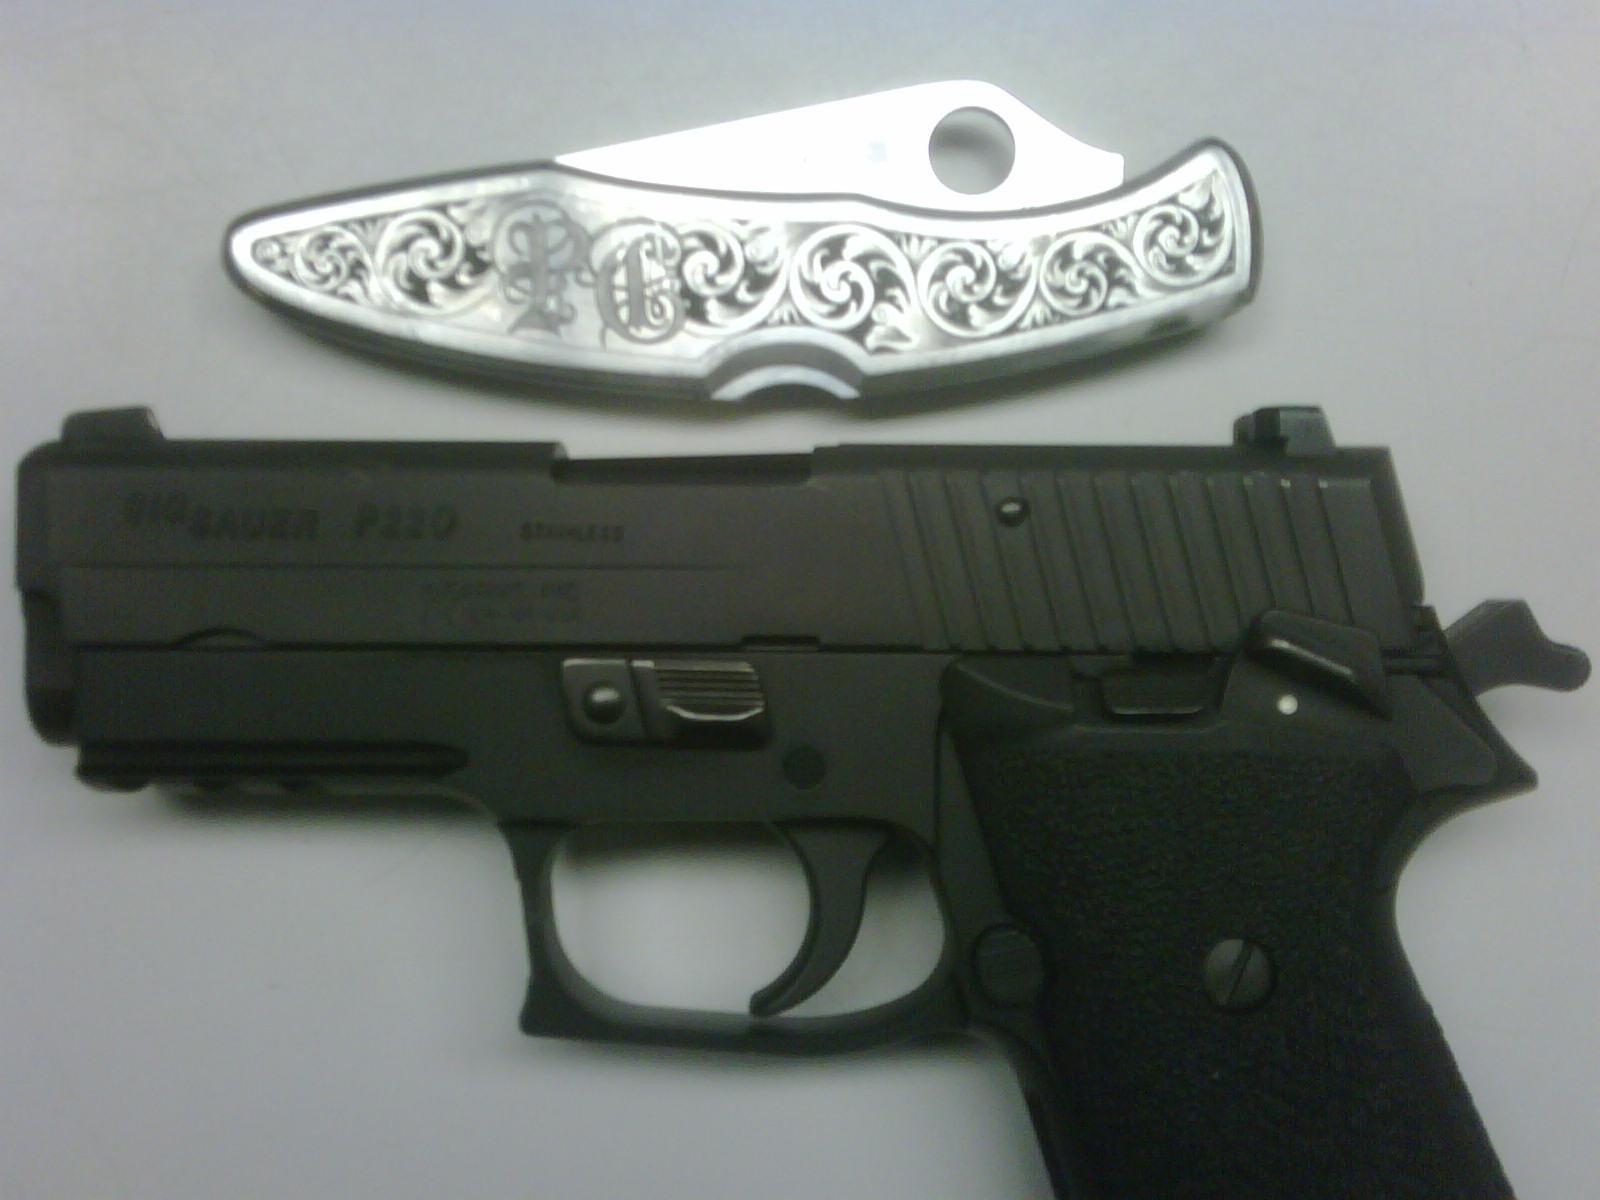 Pics of my SIG P220 SAO in Comp-Tac-img00162-20090302-1934.jpg